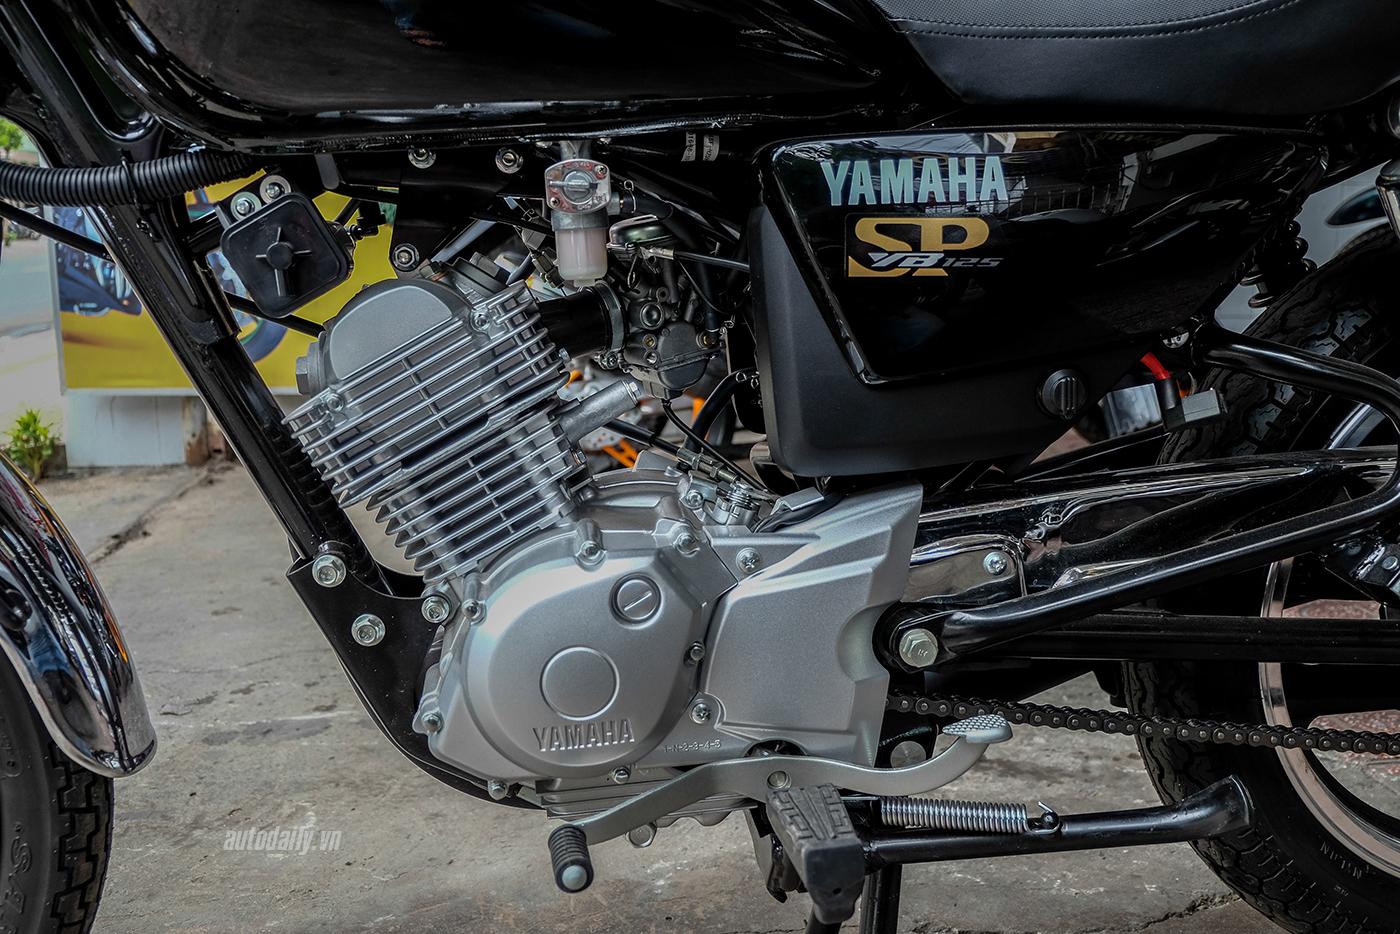 yamaha-yb125-sp-25.jpg